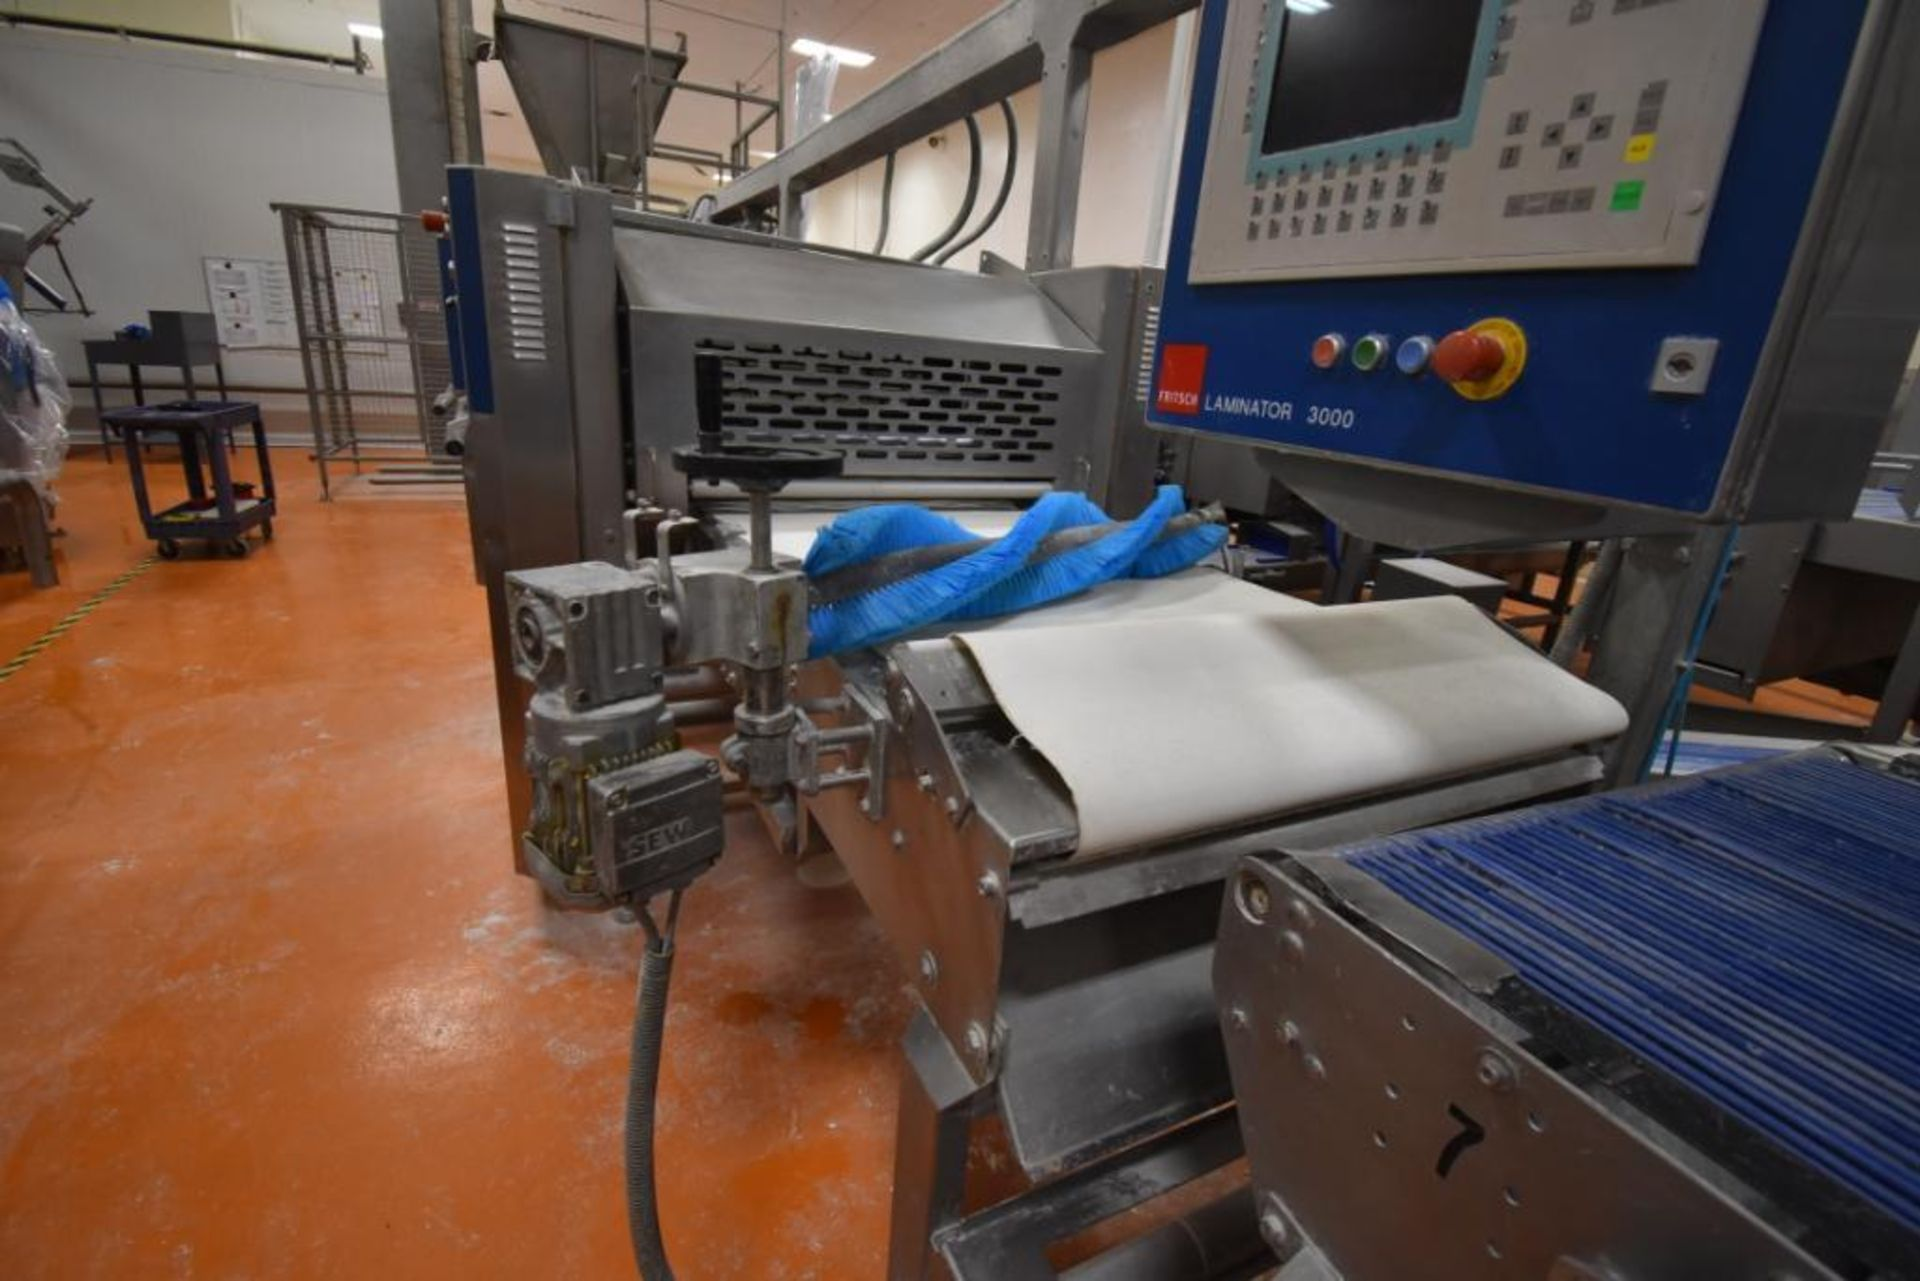 2007 Fritsch Laminator 3000 dough line - Image 78 of 280